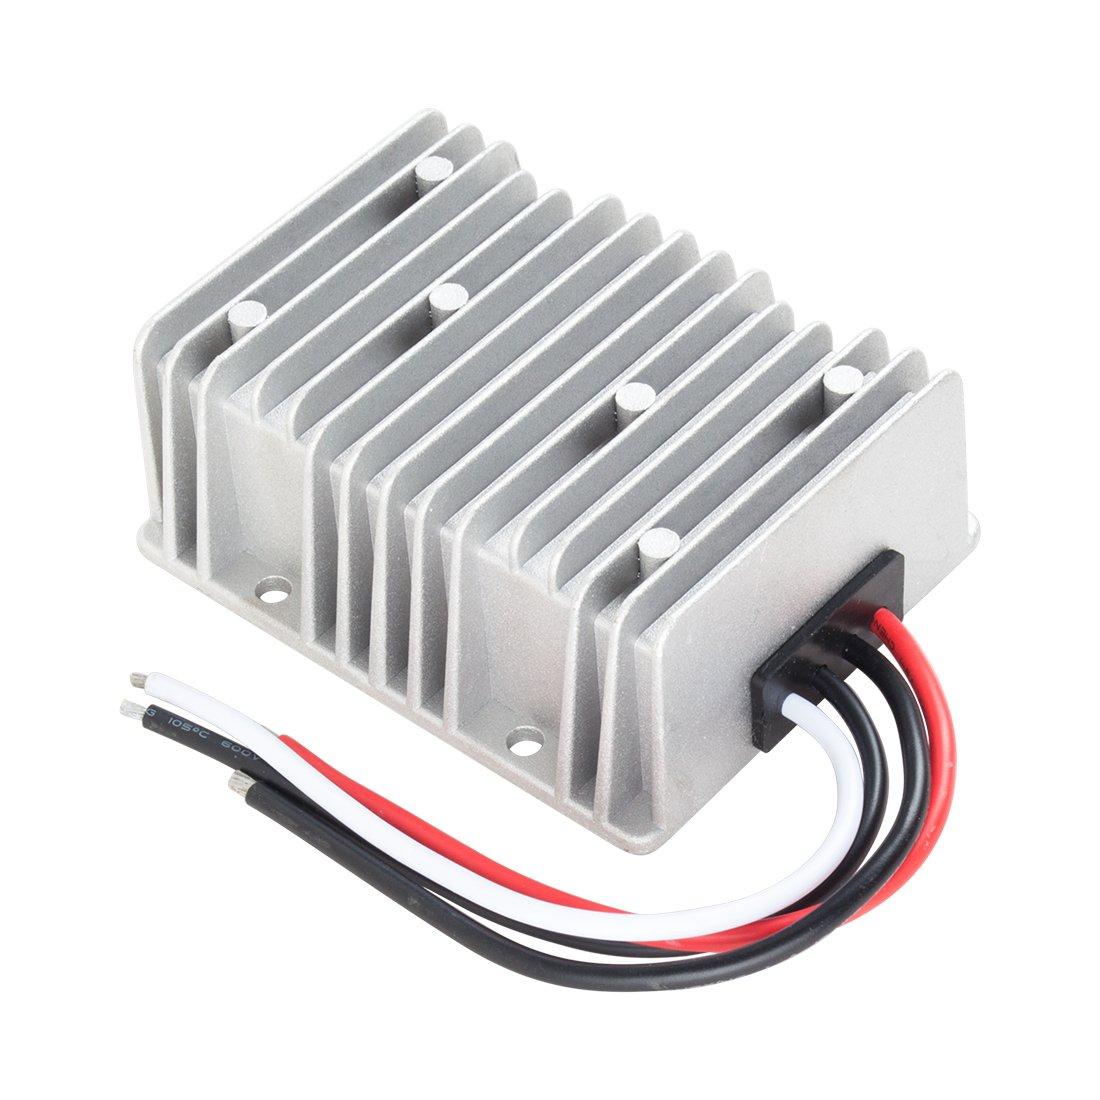 uxcell Voltage Converter Regulator DC 13.8V to List price Luxury goods 48V 30A